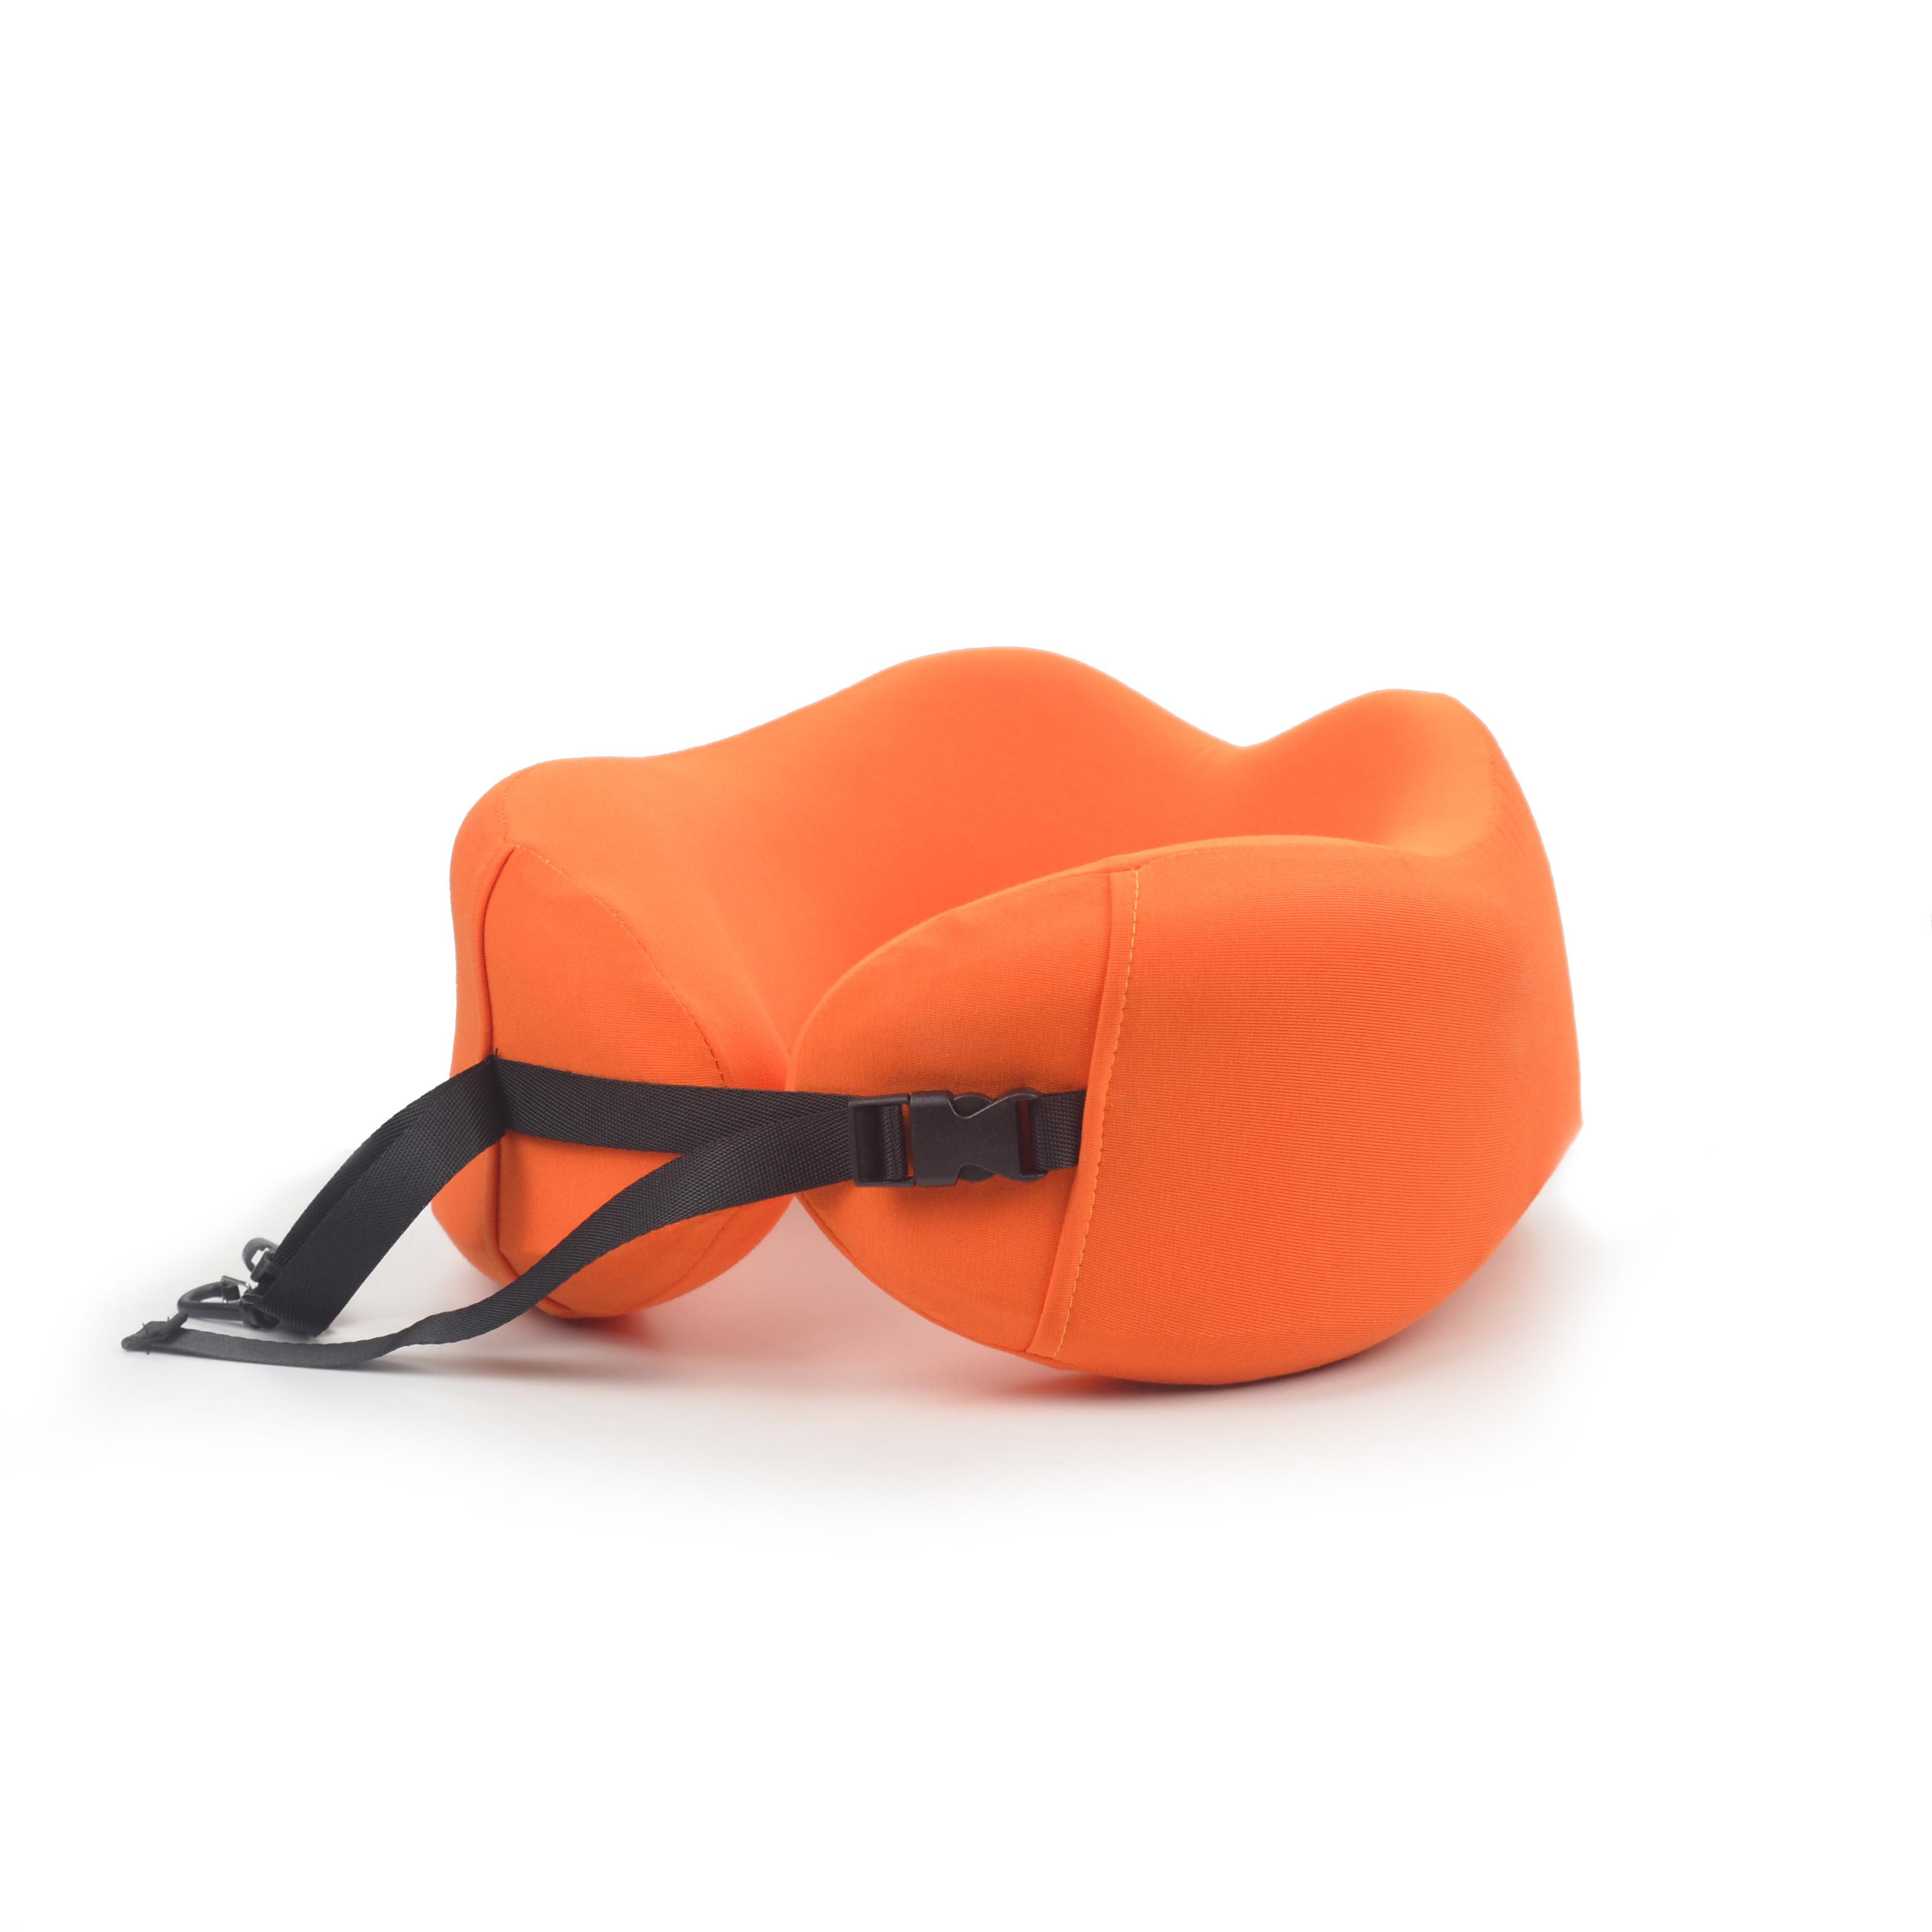 Orange solid color custom travel pillow foldable travel neck pillow